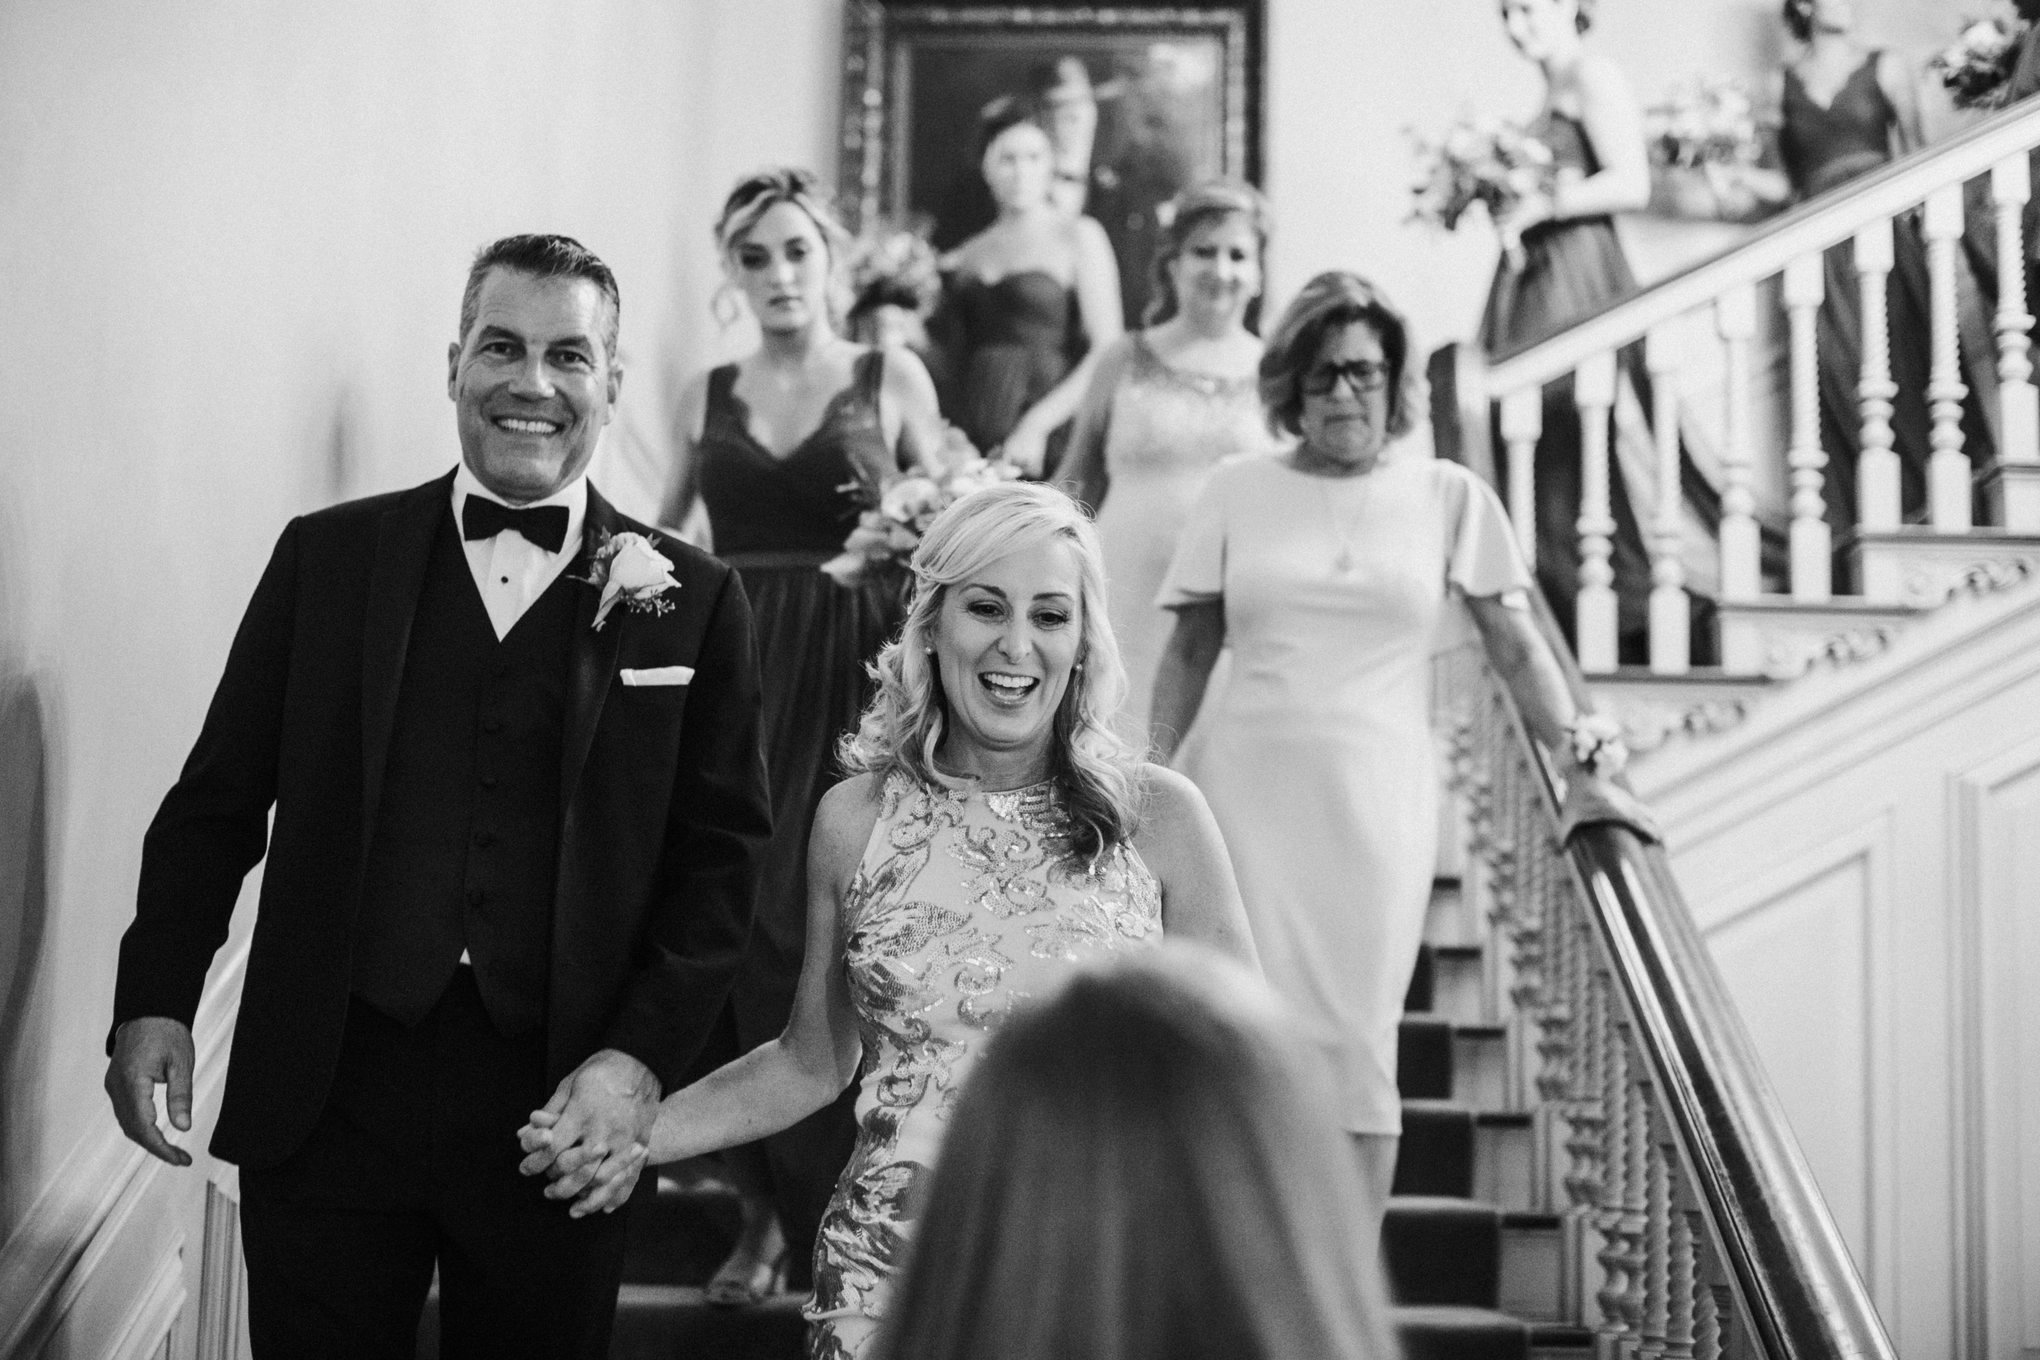 Lena_Mirisola_2017_Weddings_-033.jpg